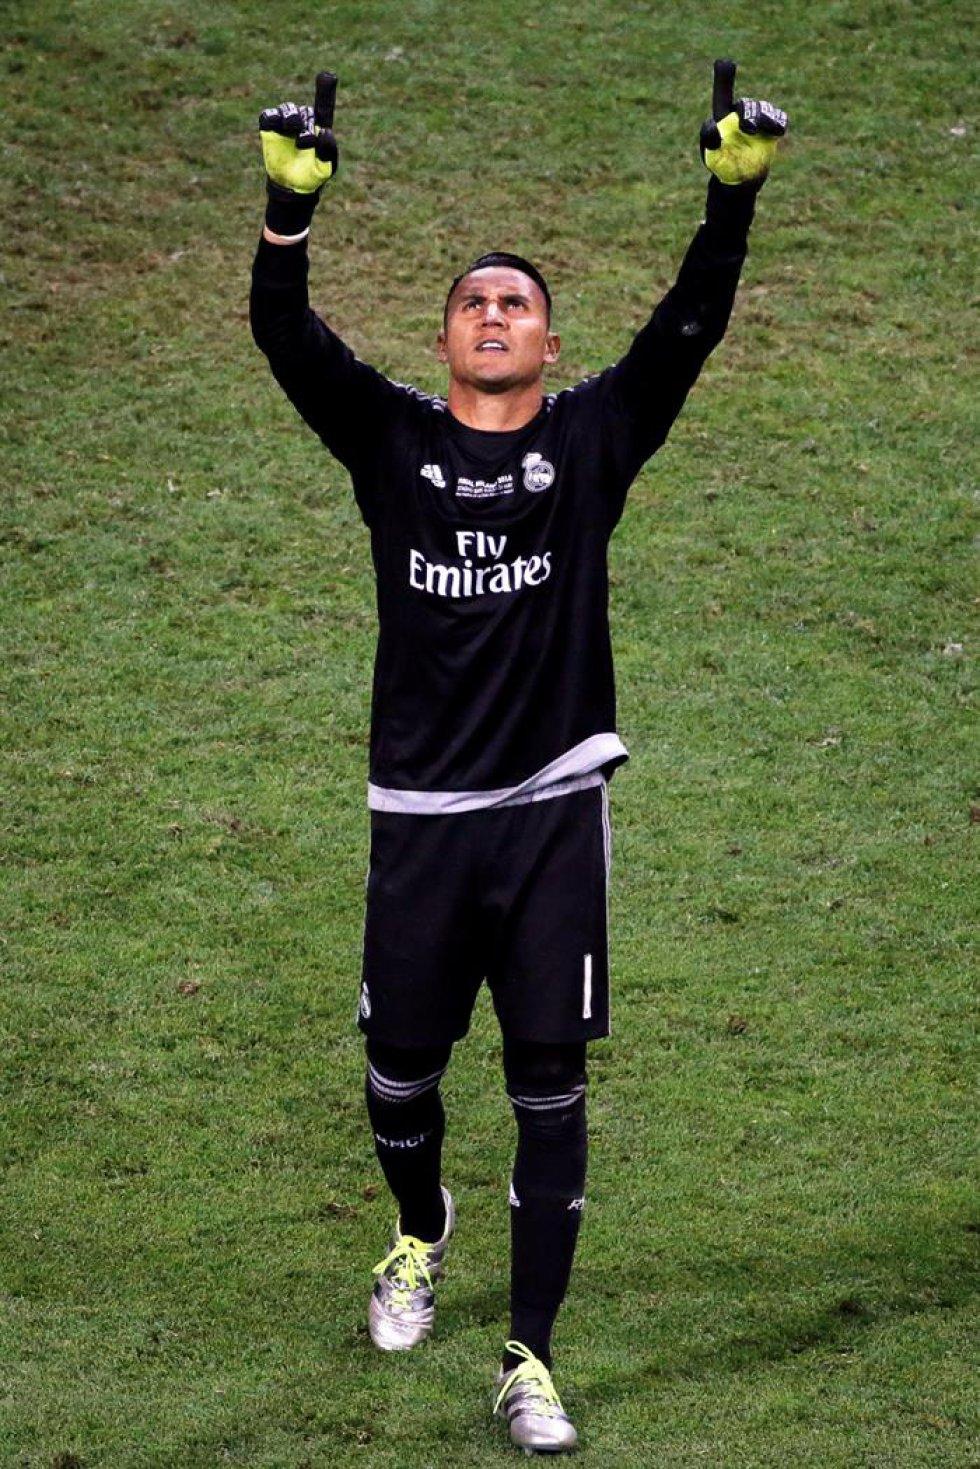 El Atlético de Madrid ha perdido tres veces la final de la Champions League.